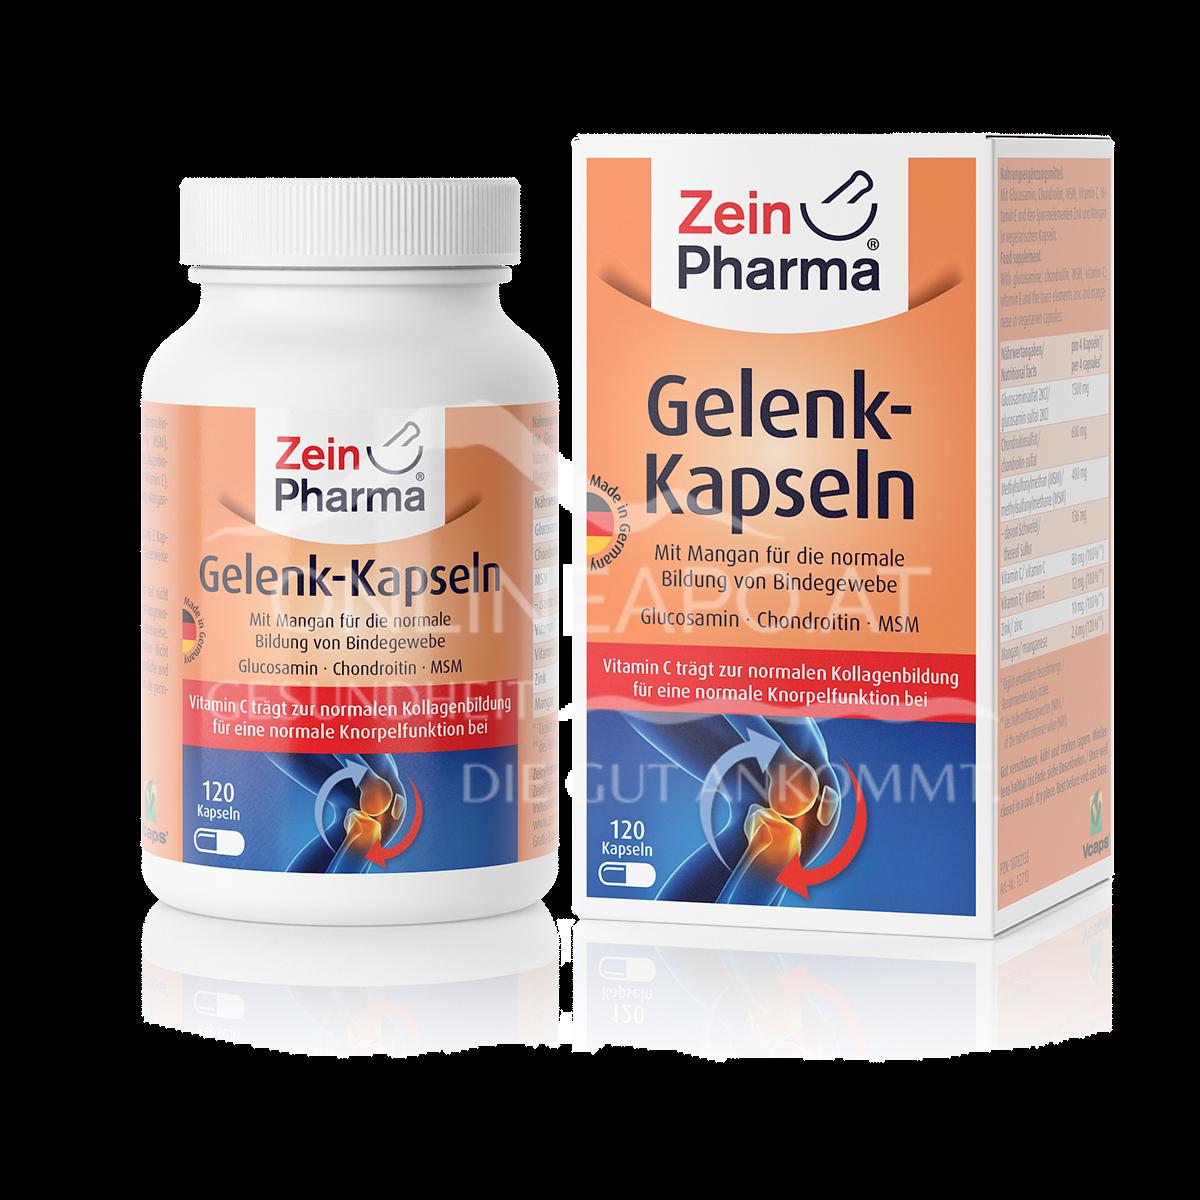 Zeinpharma Gelenk Kapseln